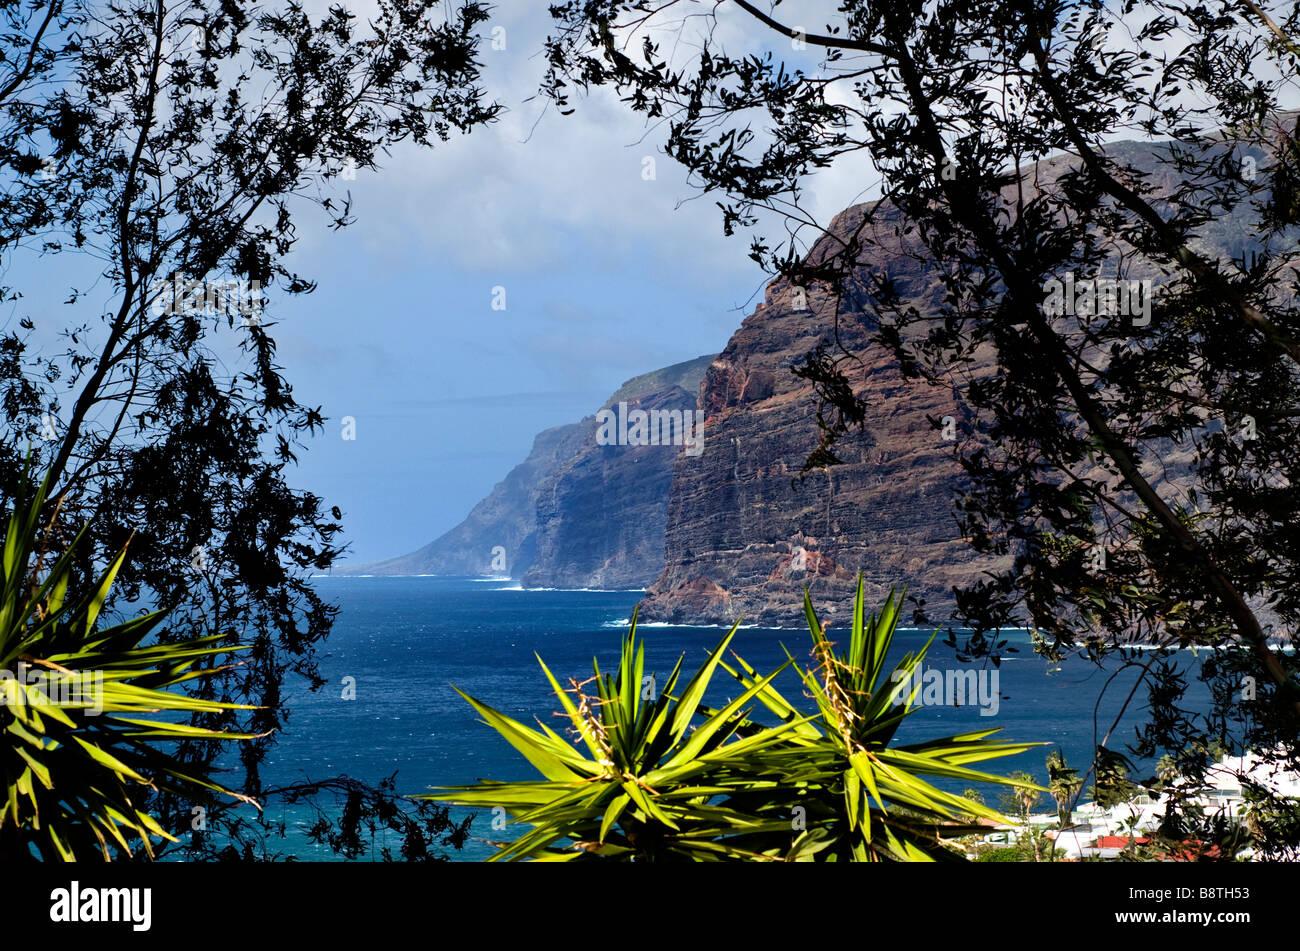 Los Gigantes Tenerife Canary Islands Spain - Stock Image